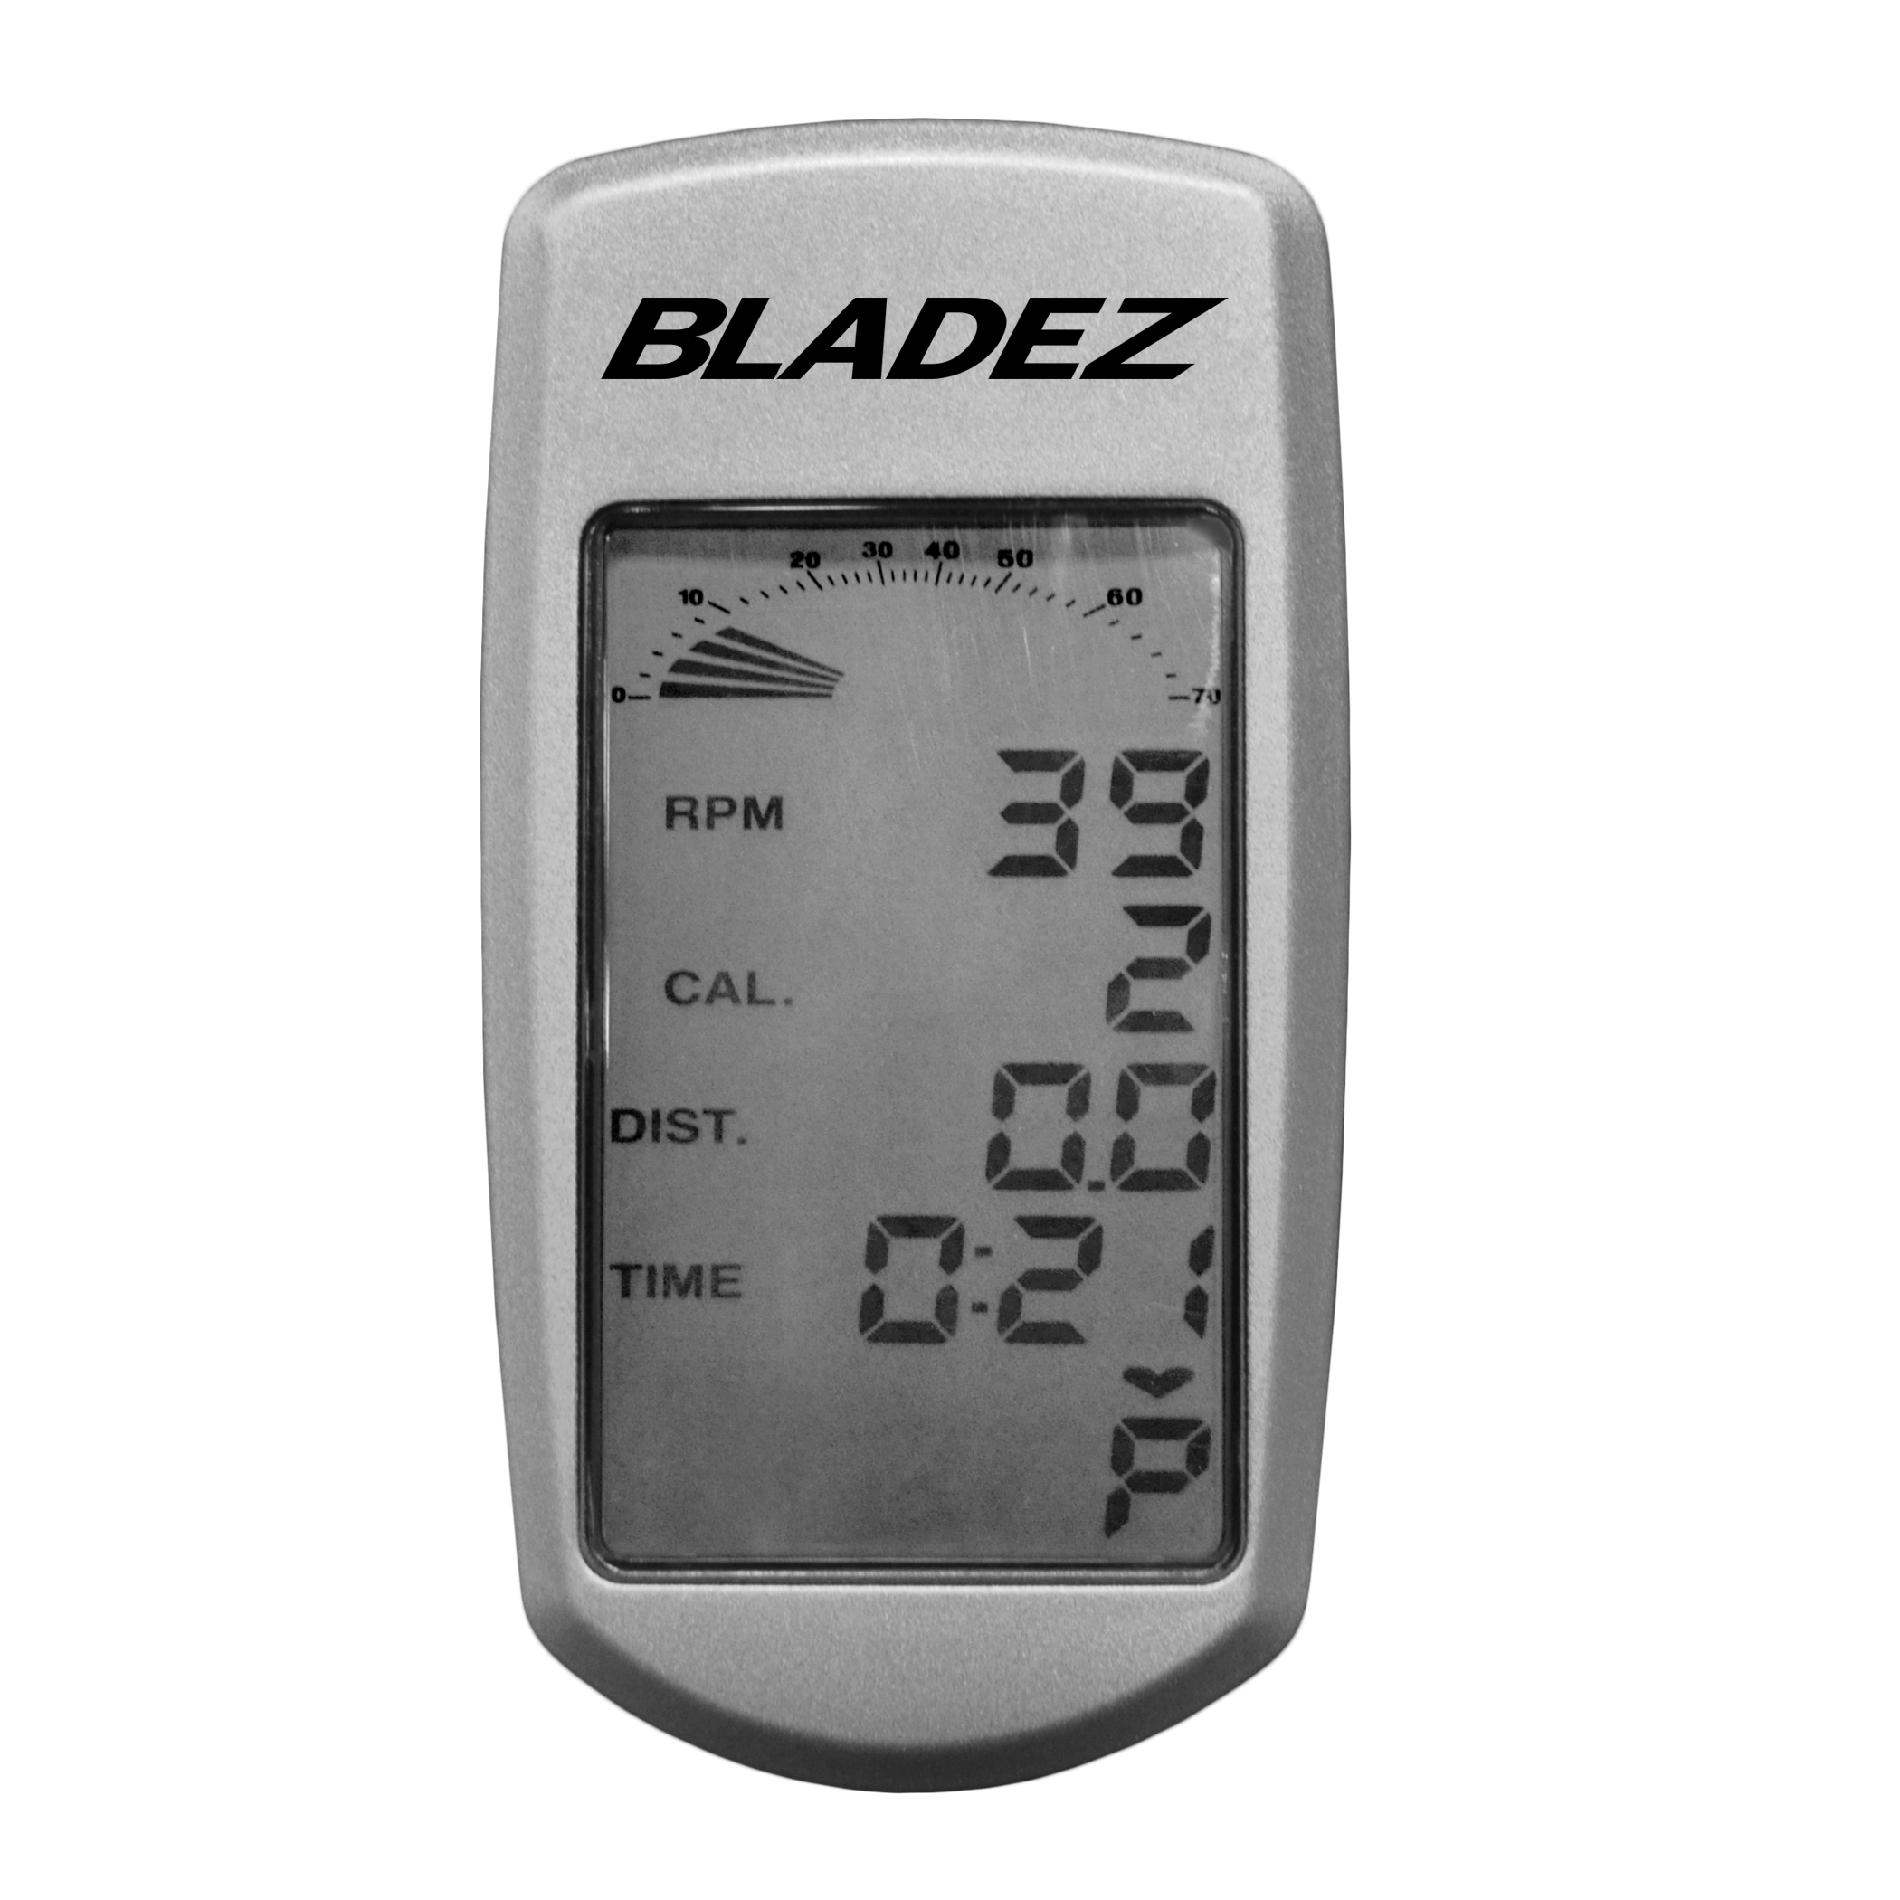 Bladez Master GS Exercise Indoor Bike